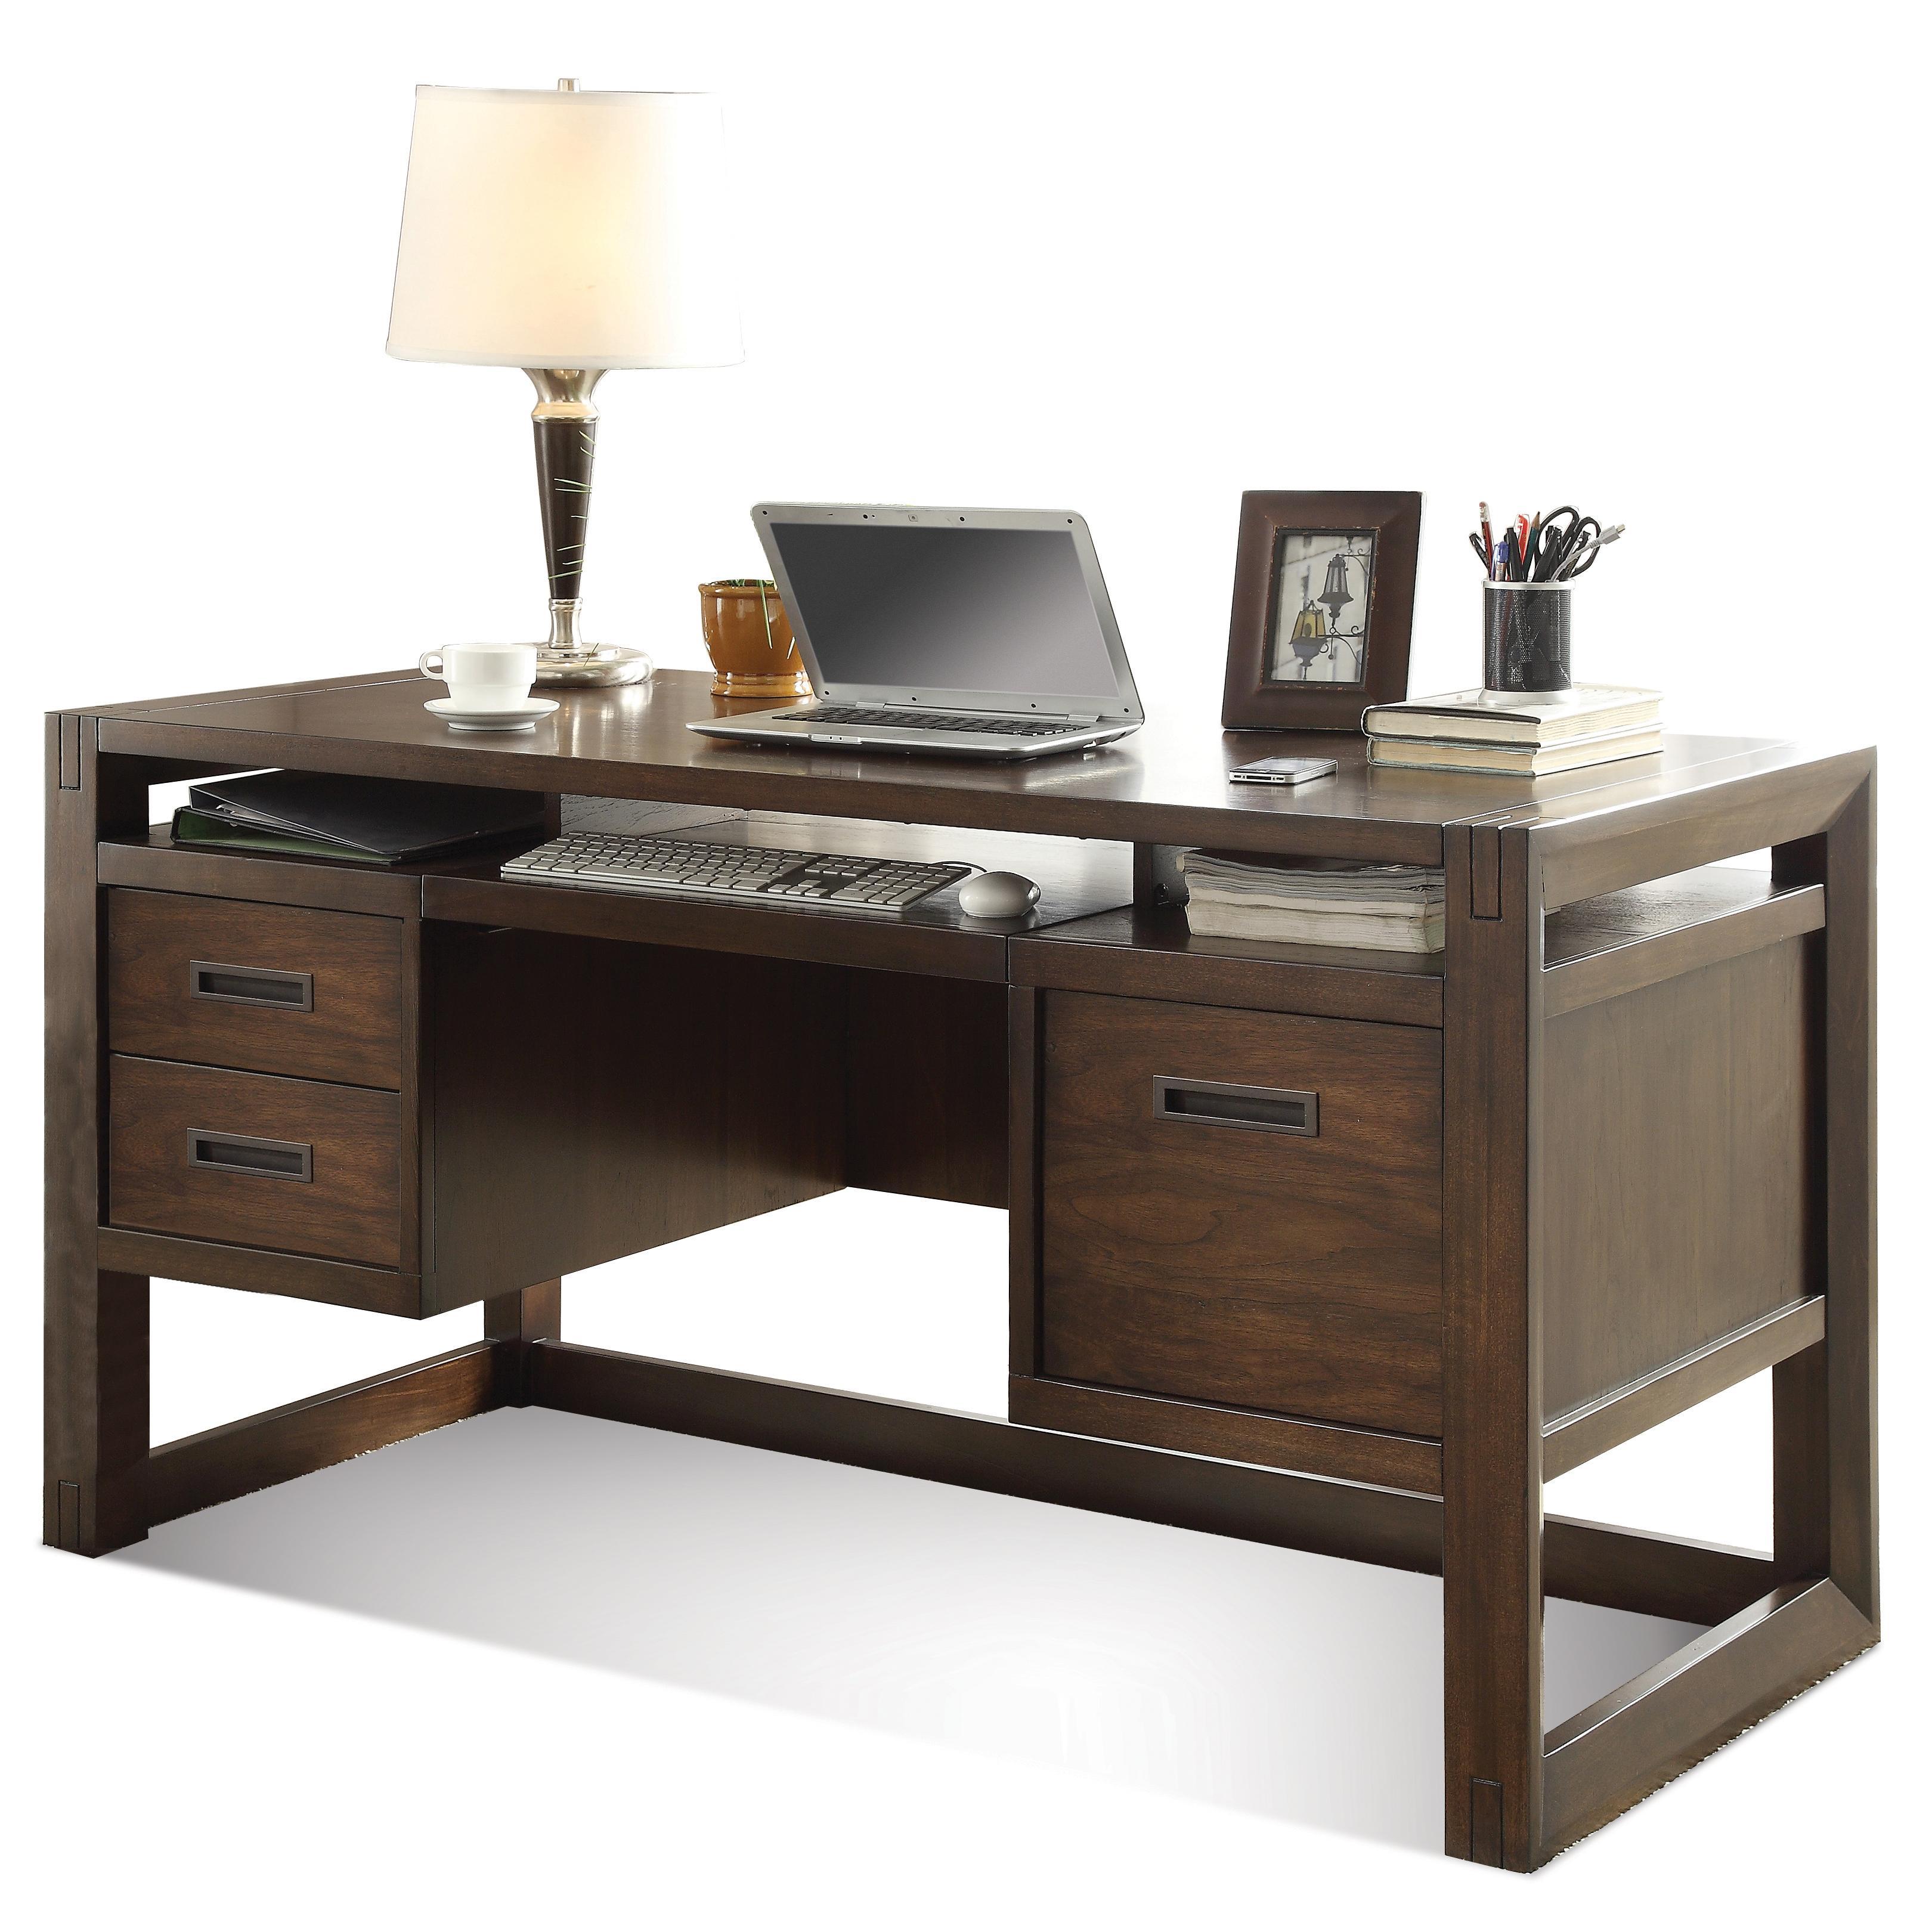 Riverside Furniture Riata Contemporary puter Desk